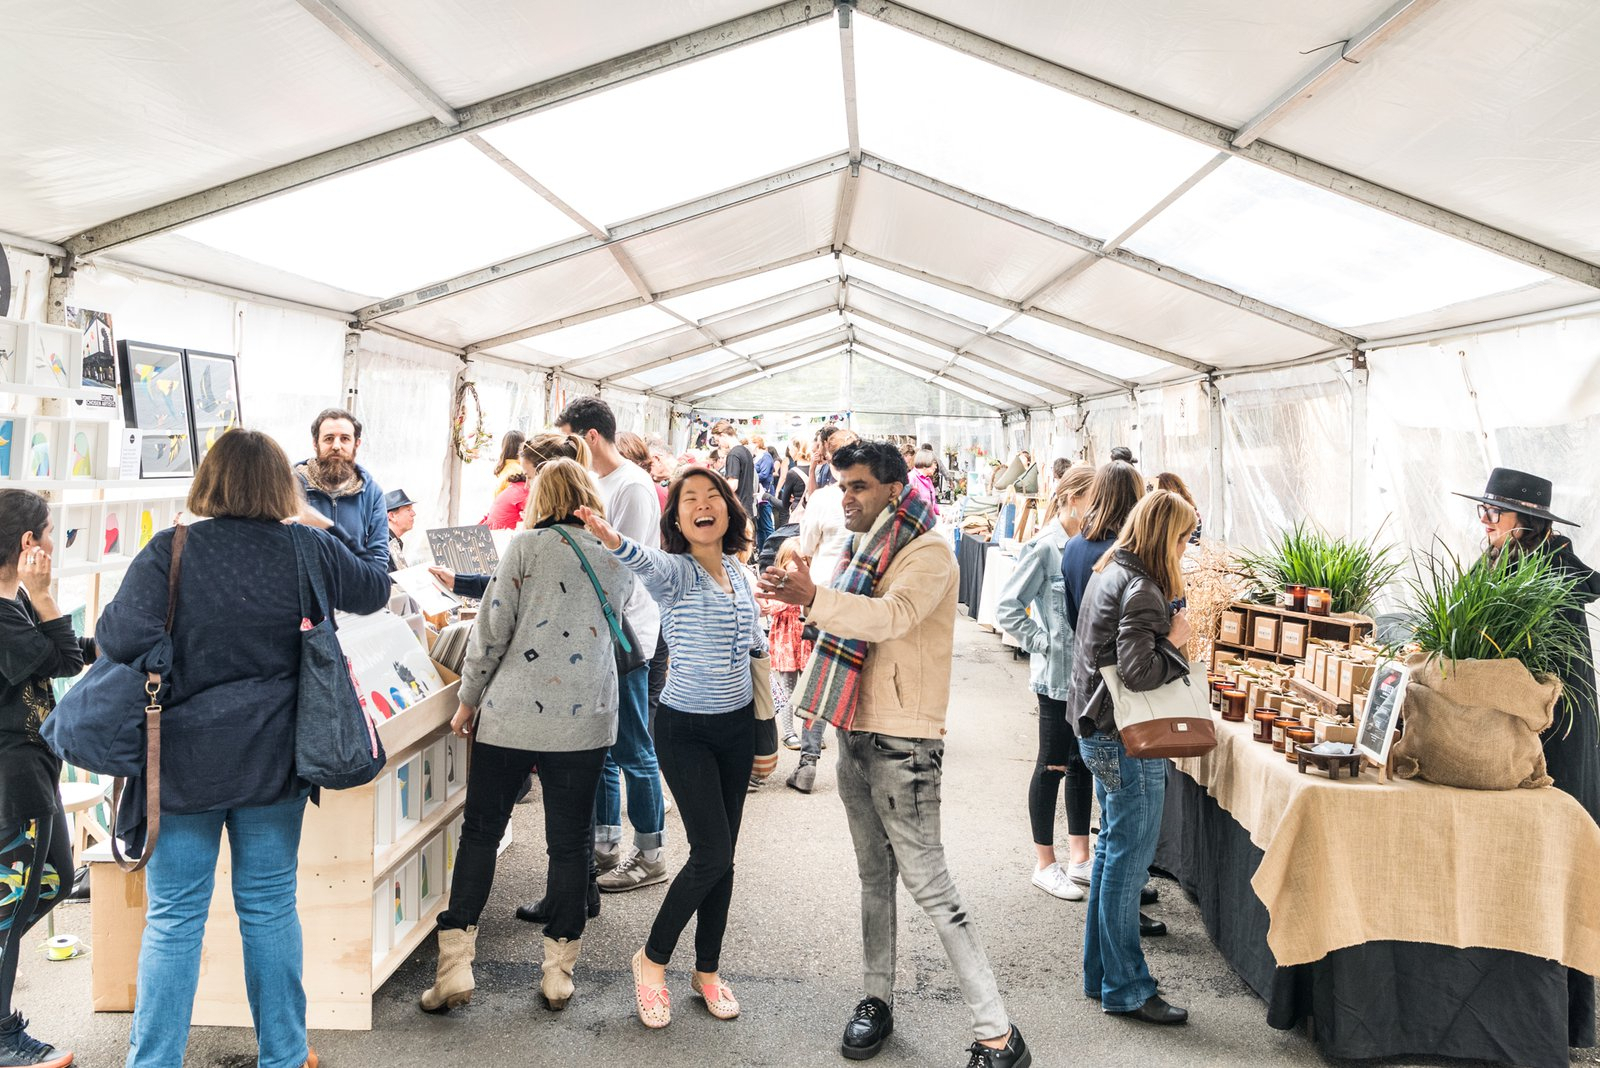 2019 Craft Calendar - Sydney Craft Week (Production) within Community Calender Sydney October 2019